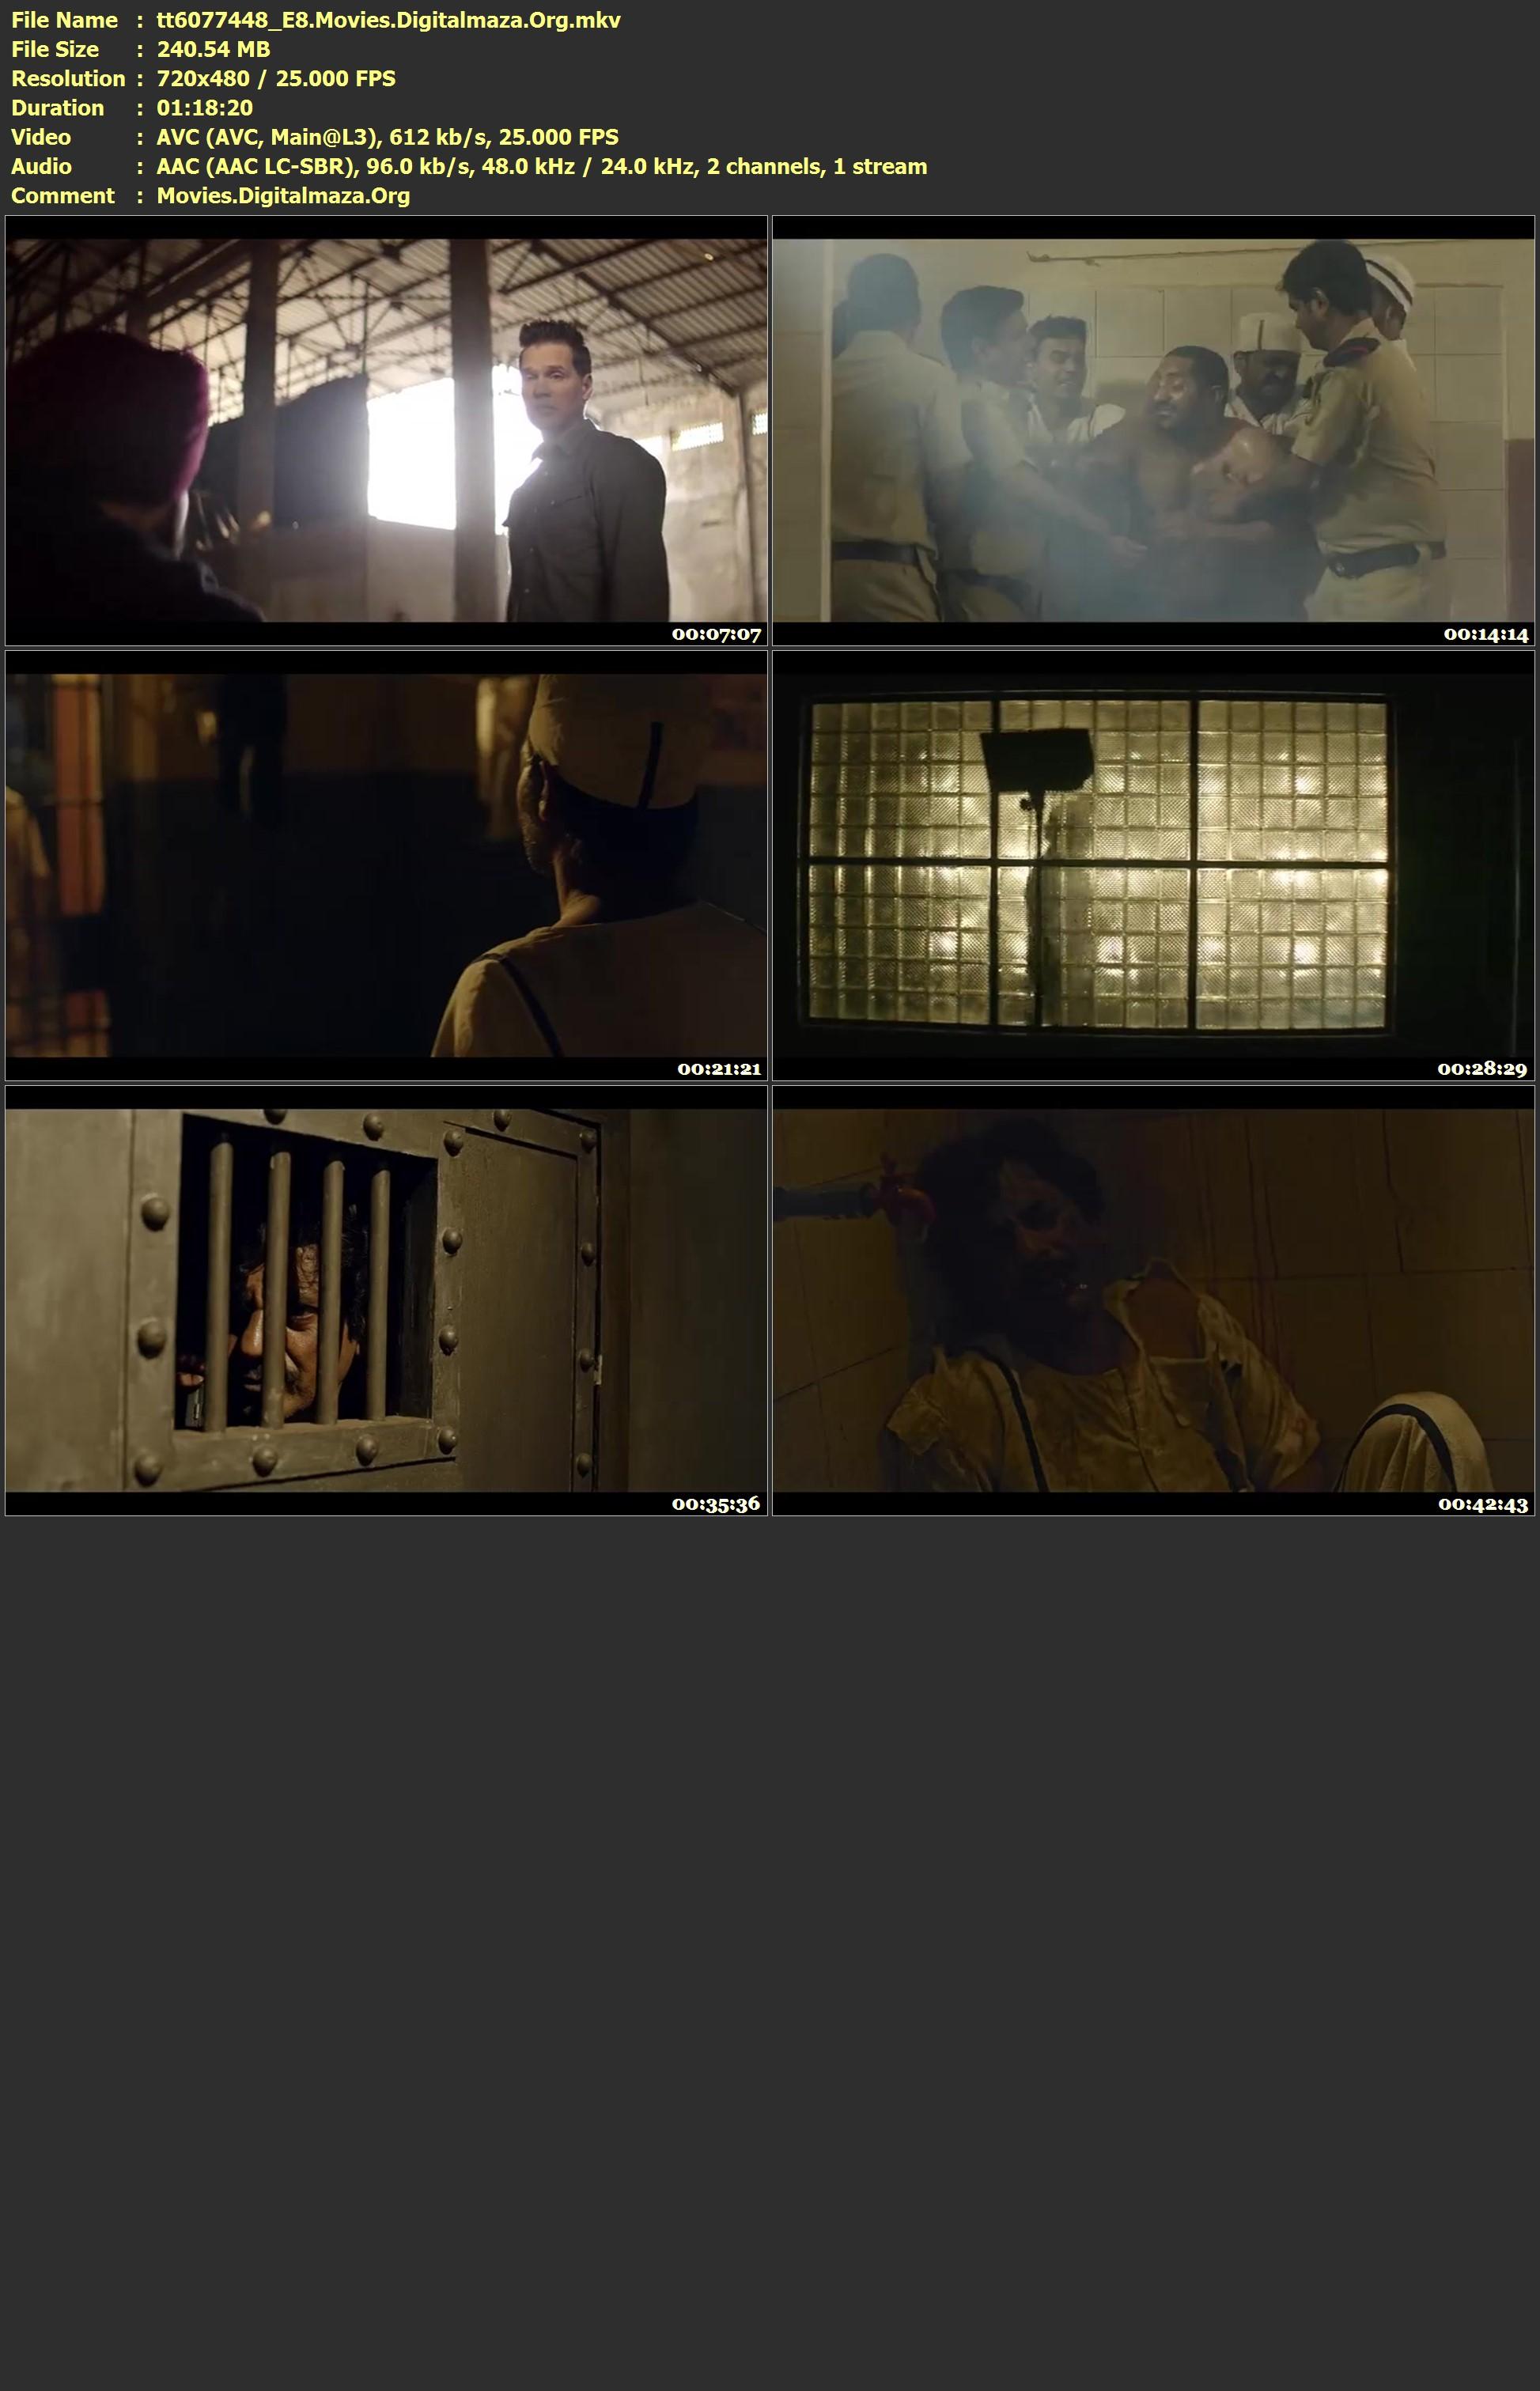 https://image.ibb.co/cyN4HJ/tt6077448_E8_Movies_Digitalmaza_Org_mkv.jpg